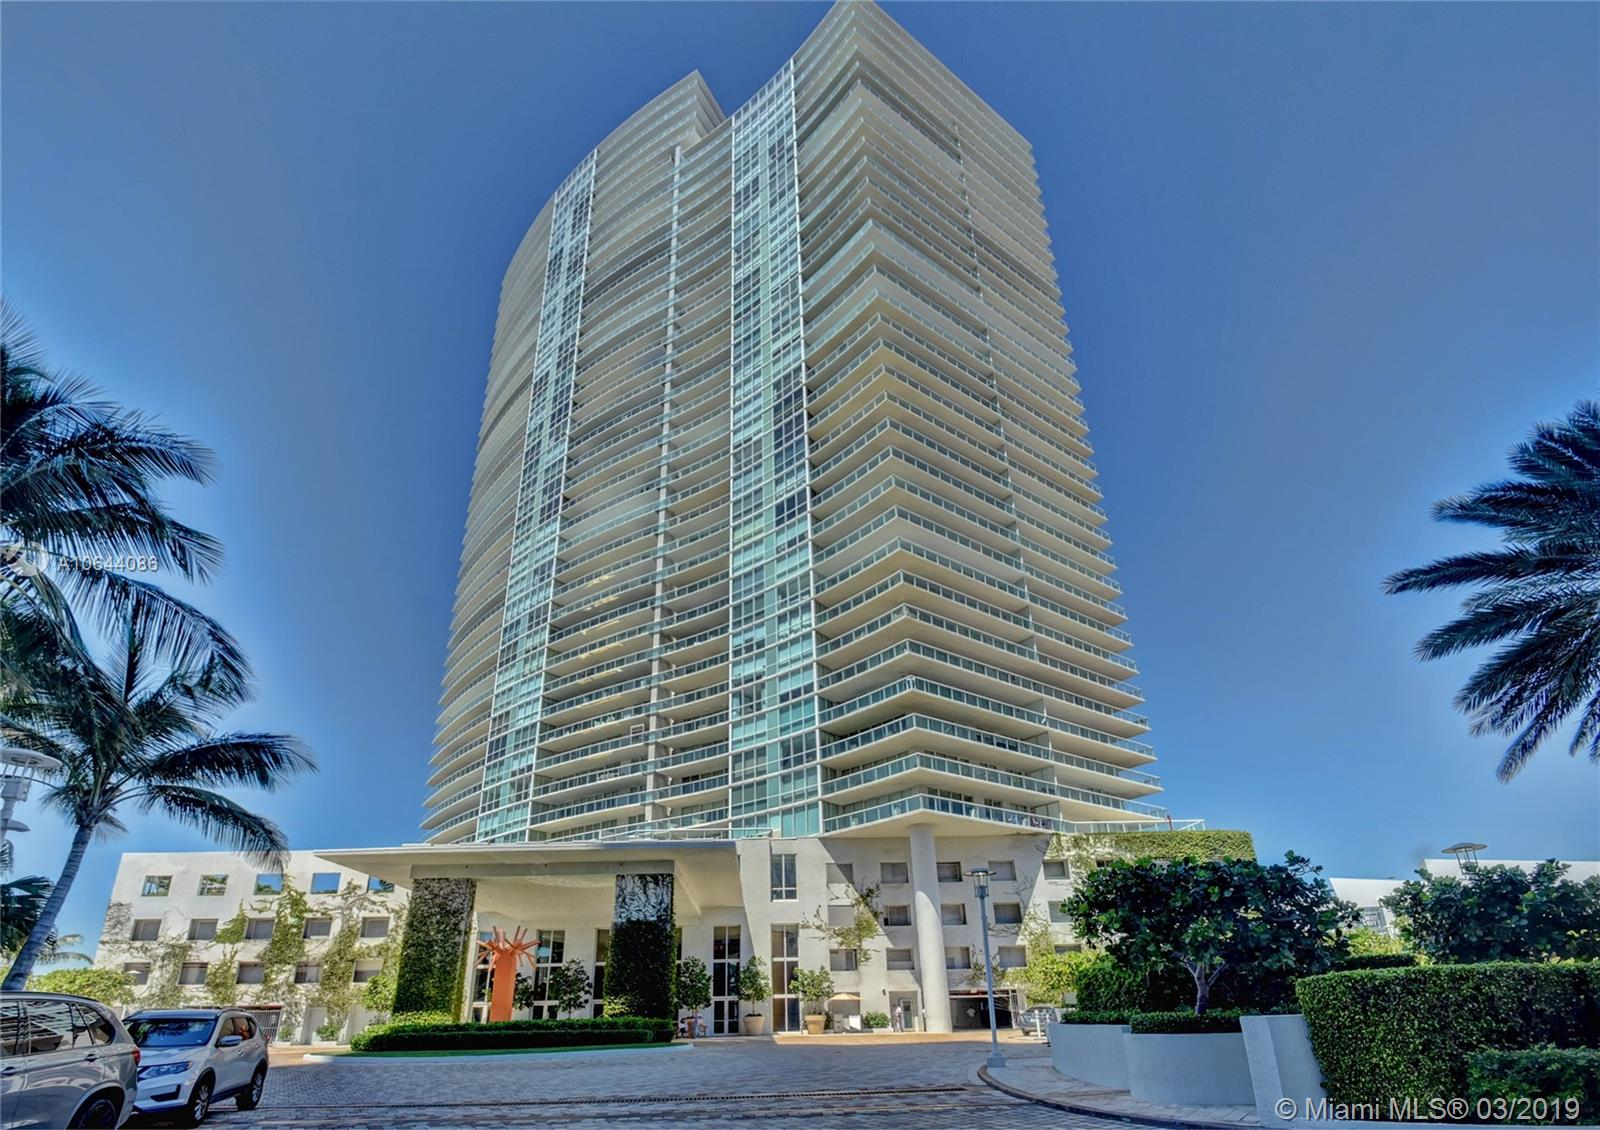 ICON South Beach image #44